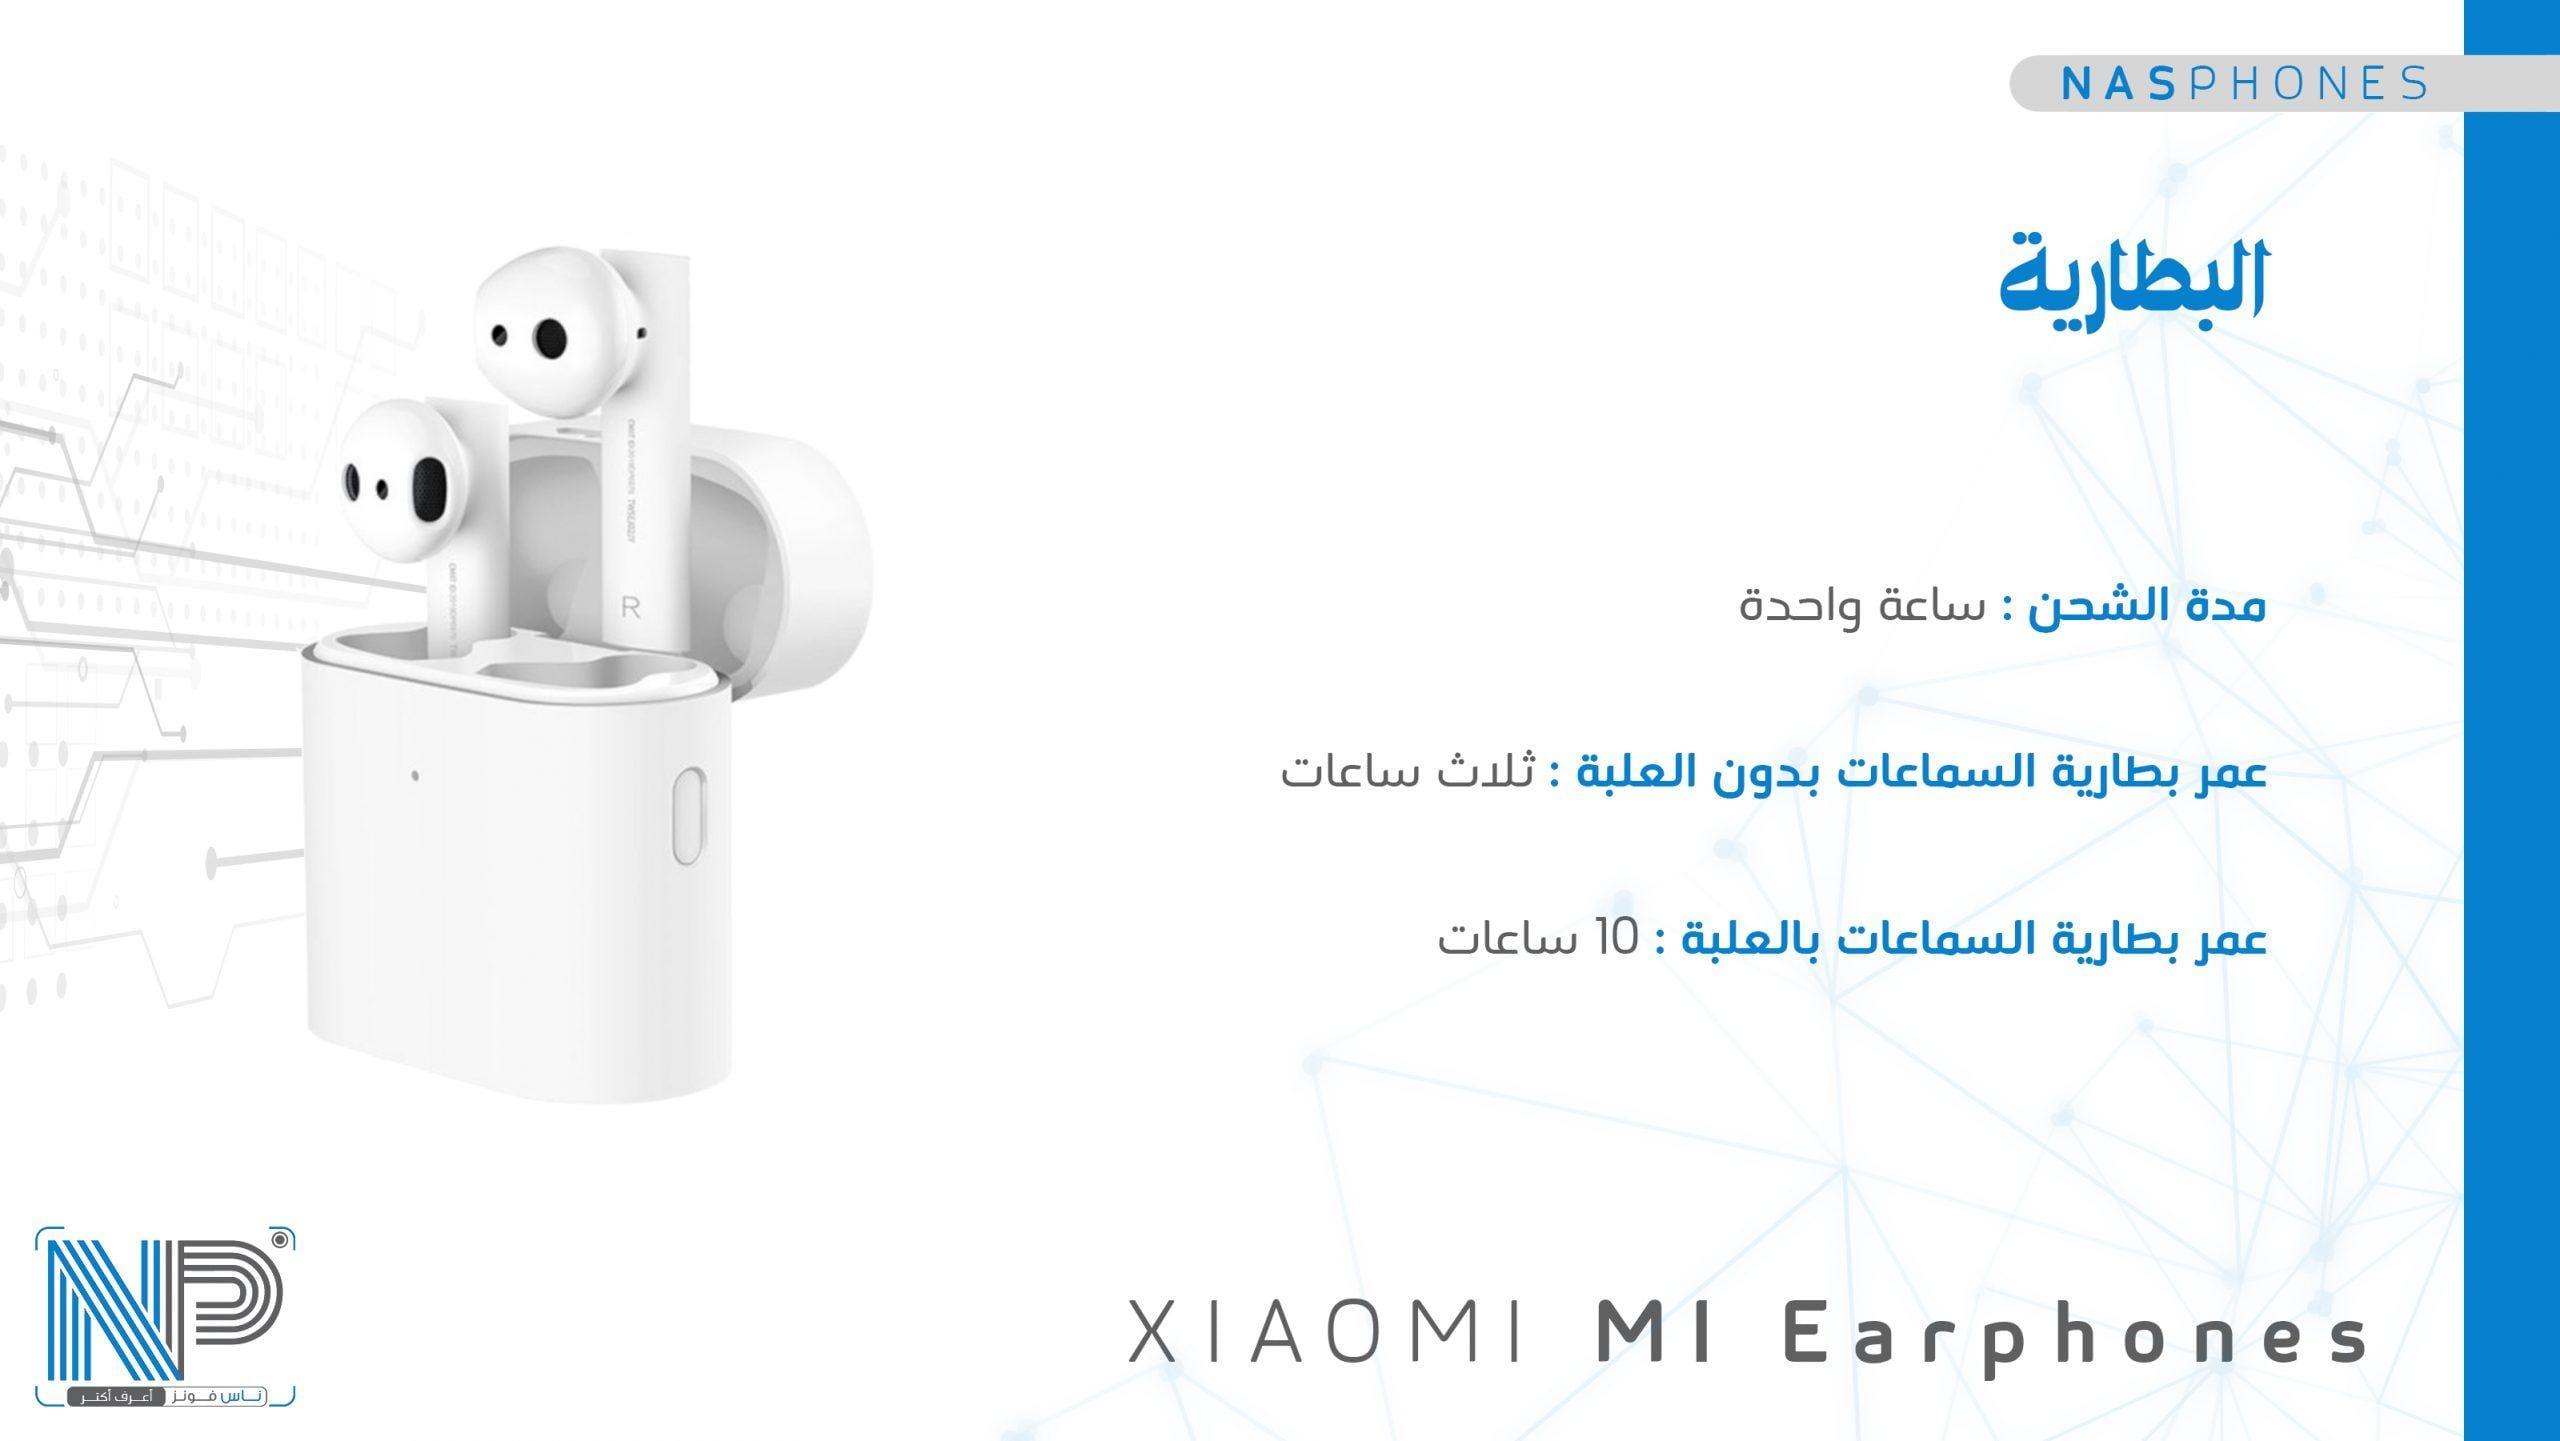 البطارية Xiaomi mi airphones